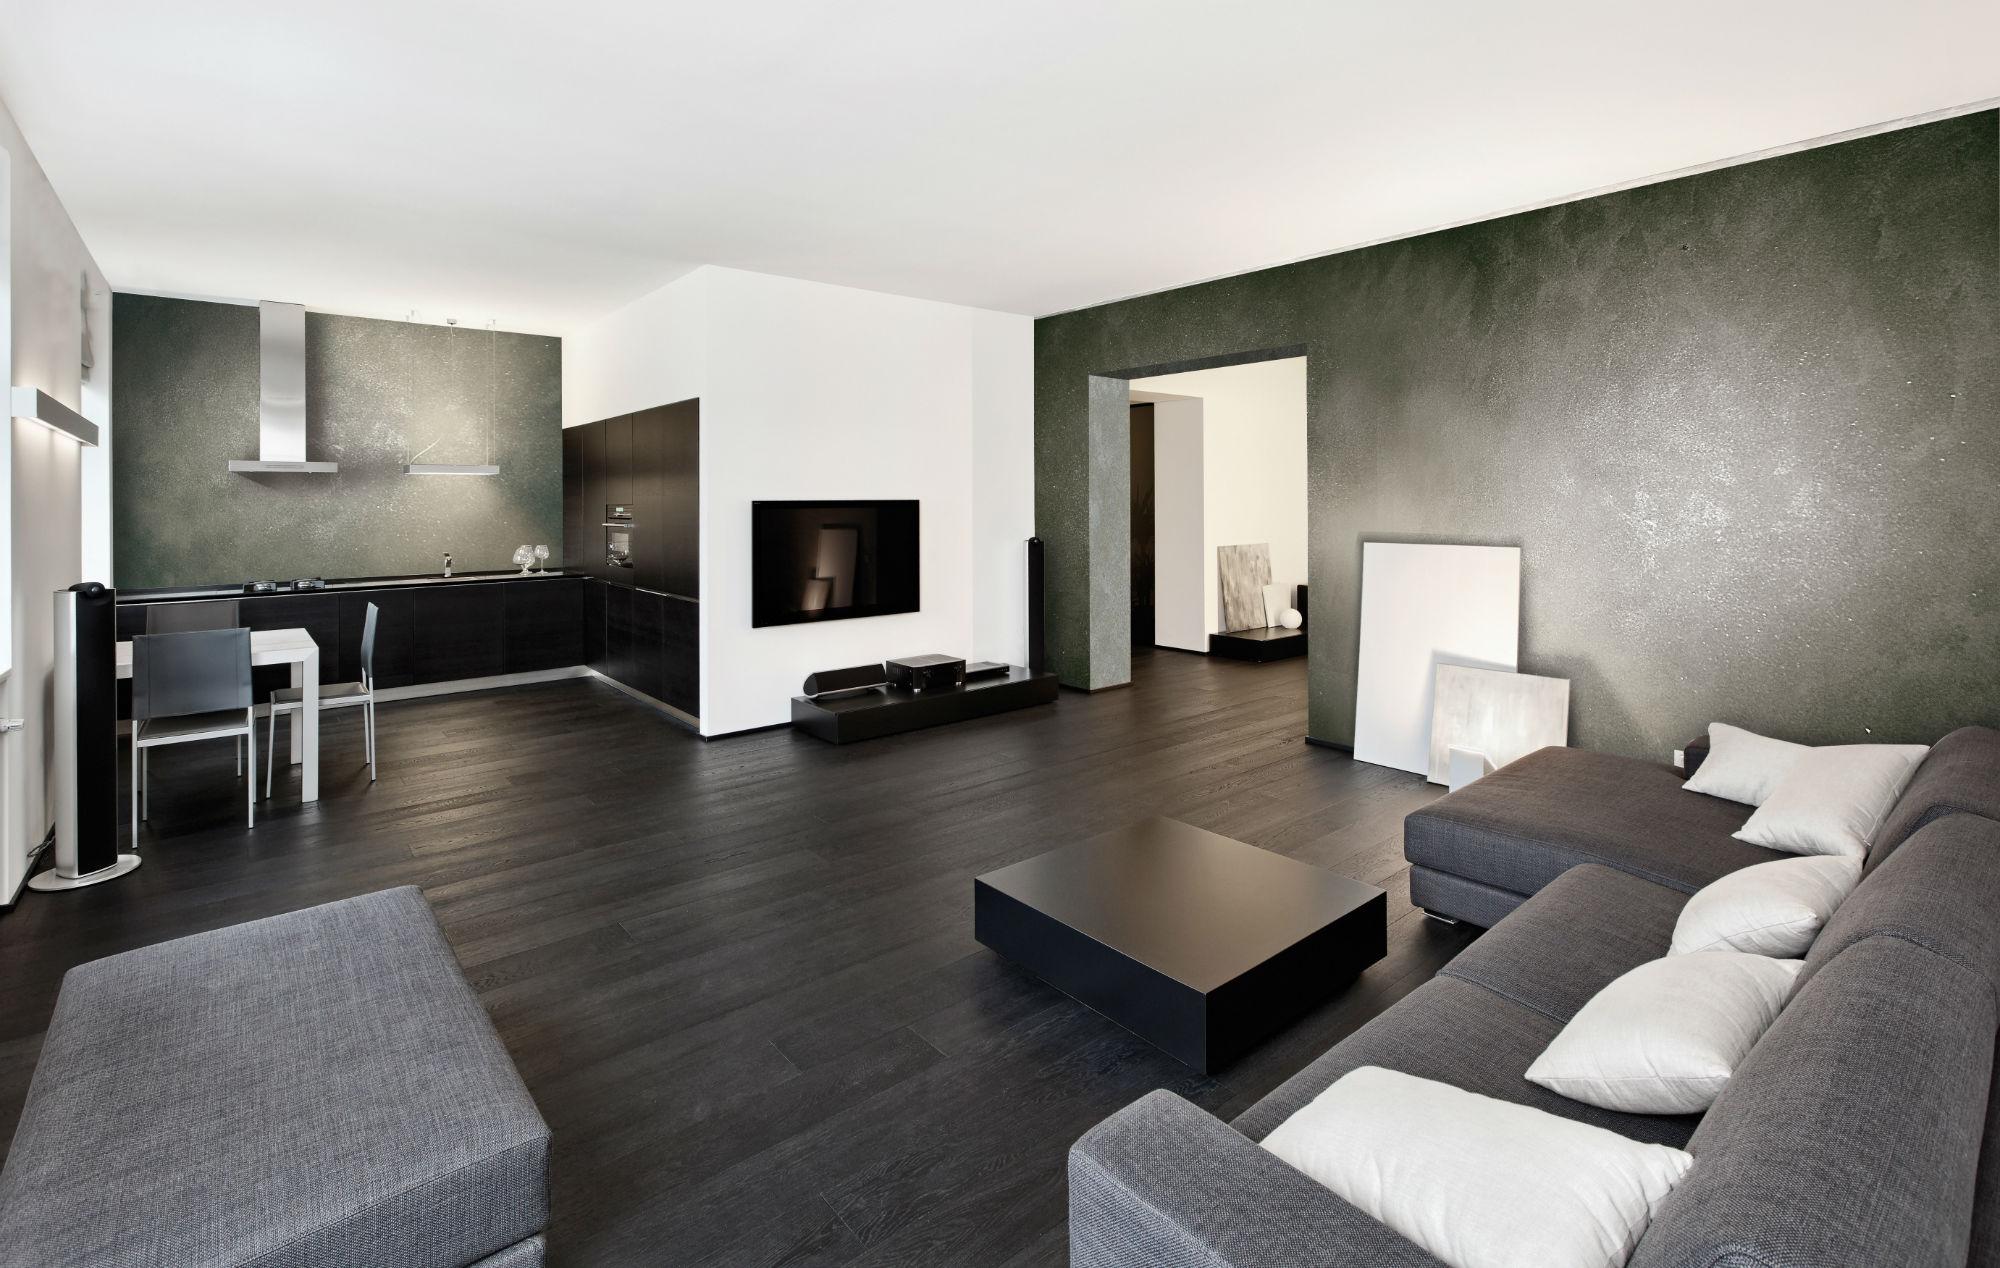 klondike light l 39 arte del decoro. Black Bedroom Furniture Sets. Home Design Ideas